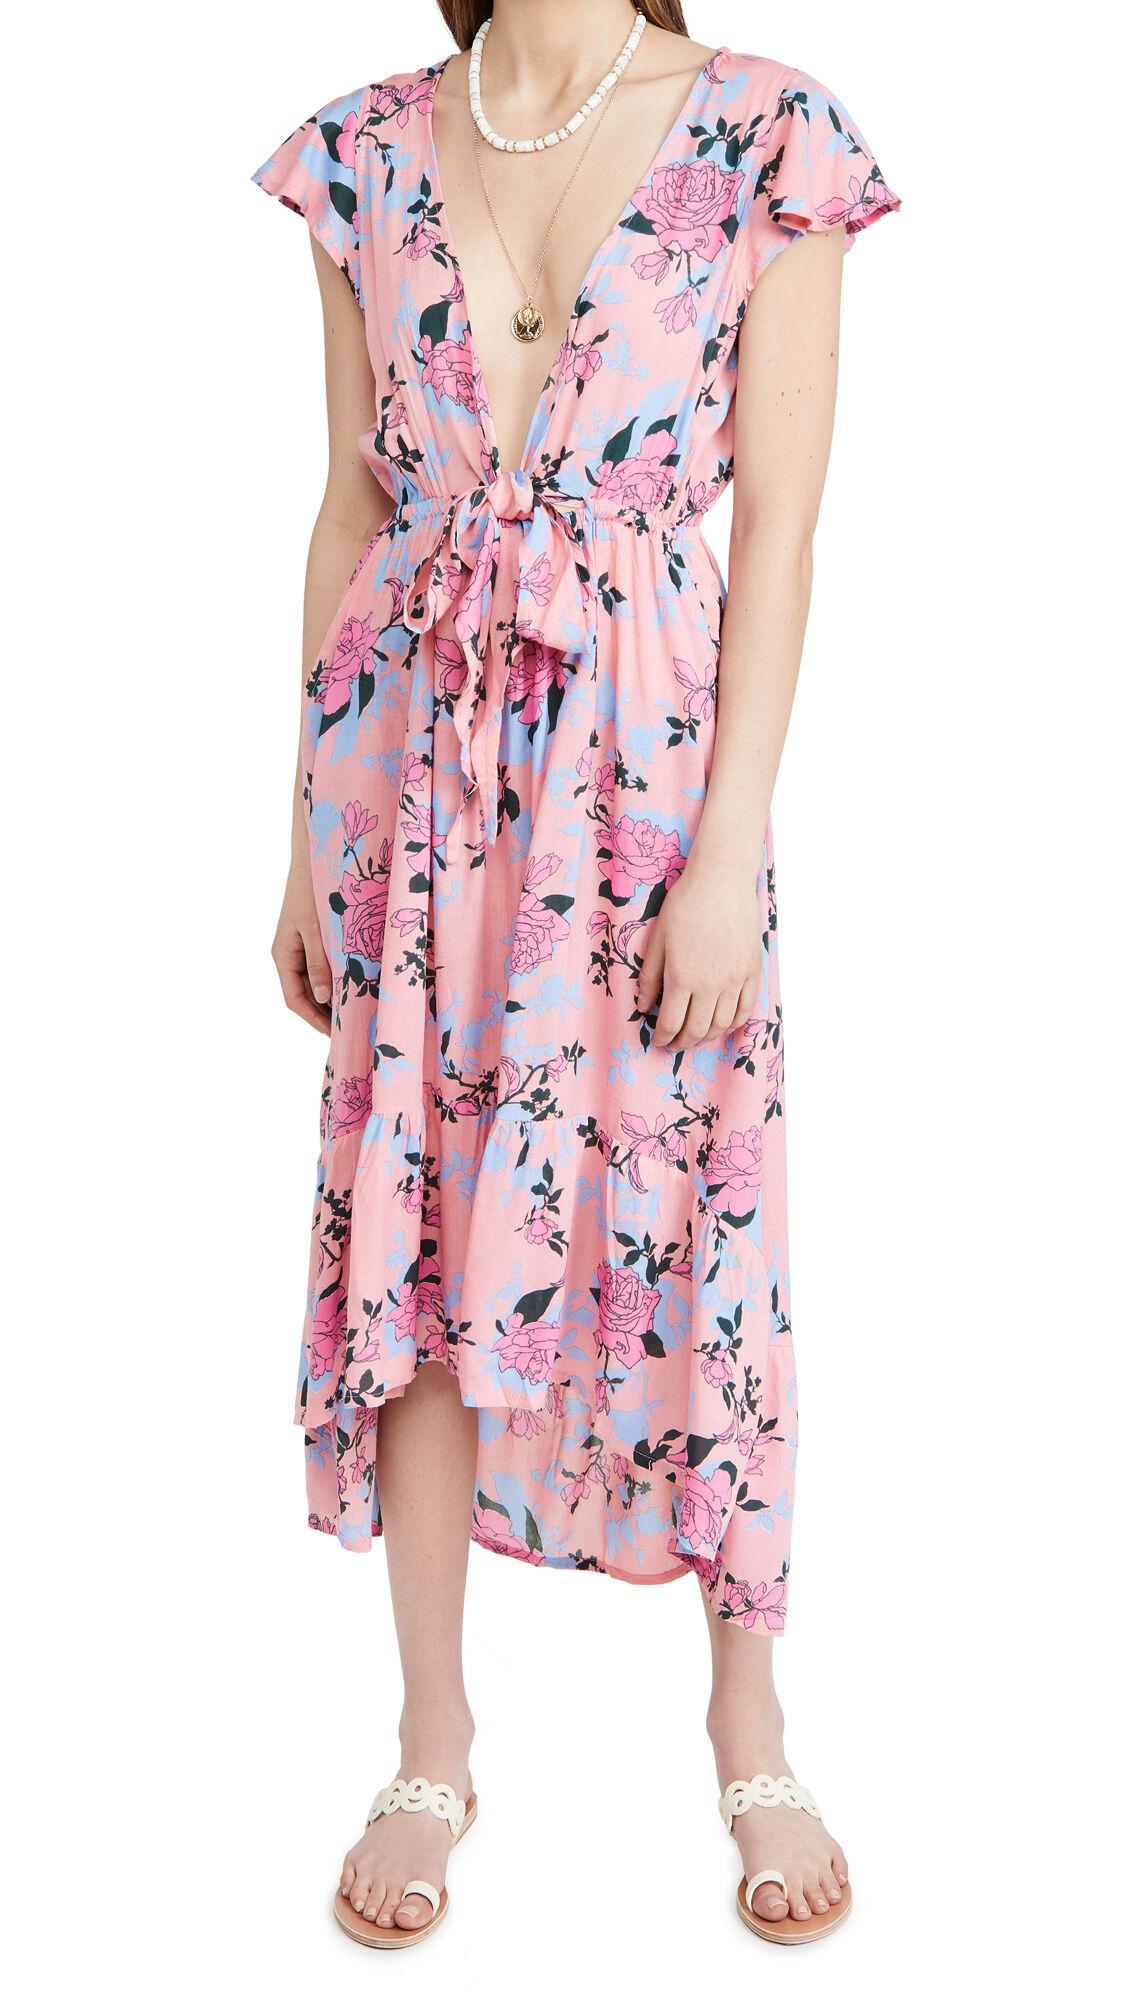 TIARE HAWAII Blake Maxi Dress  - Secret Garden Pink - Size: One Size